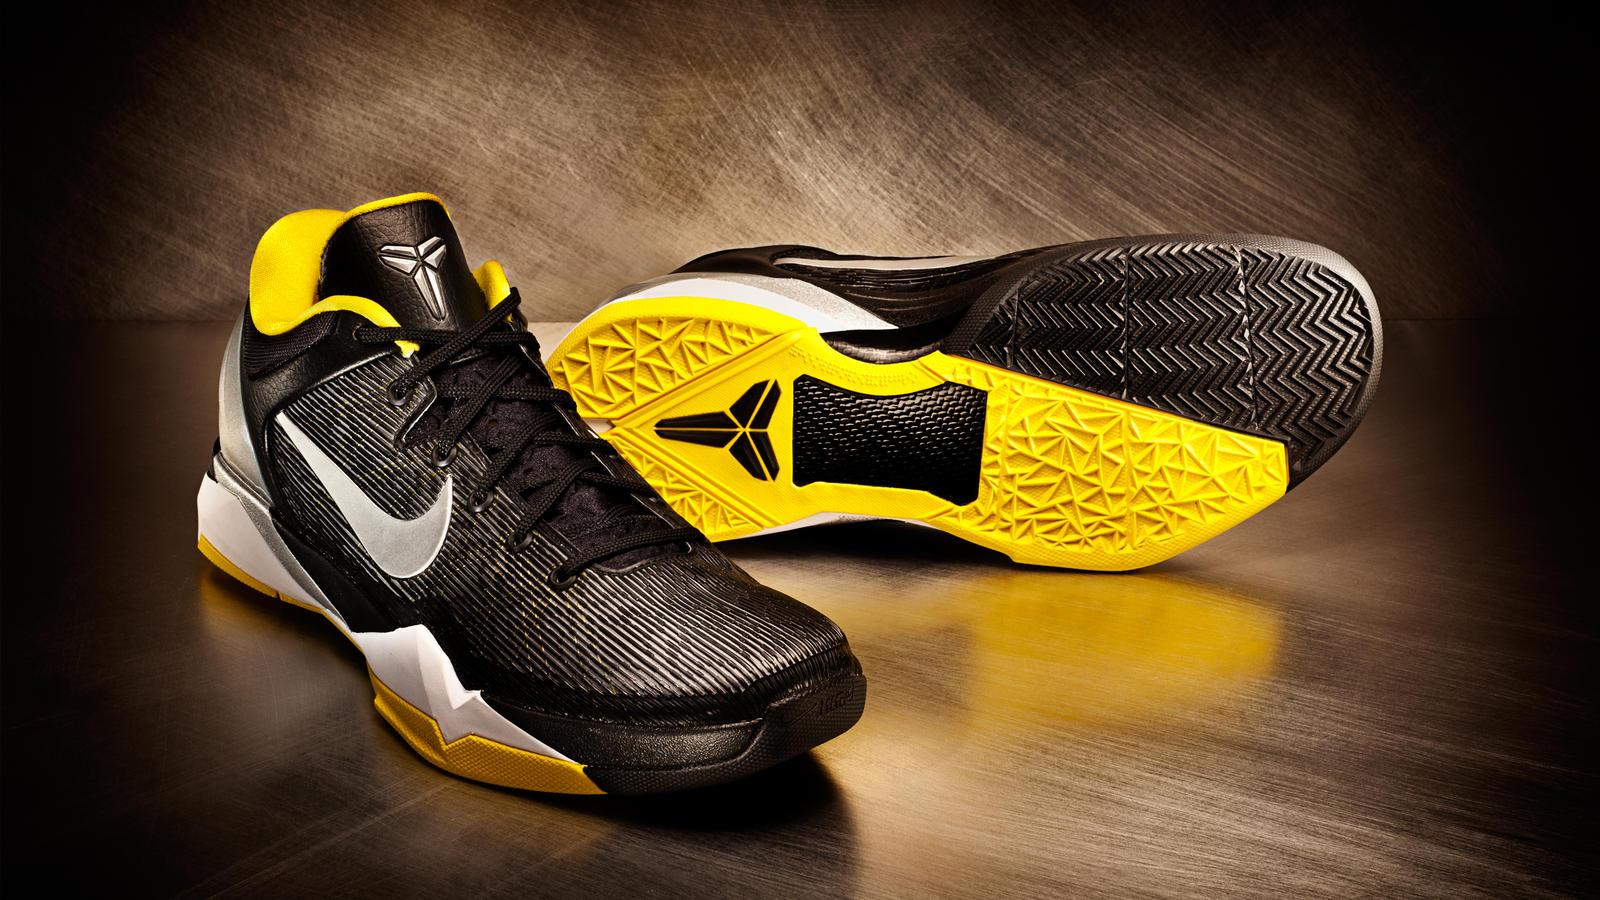 separation shoes e3bda dba88 Nike Zoom Kobe VII - Attack Fast